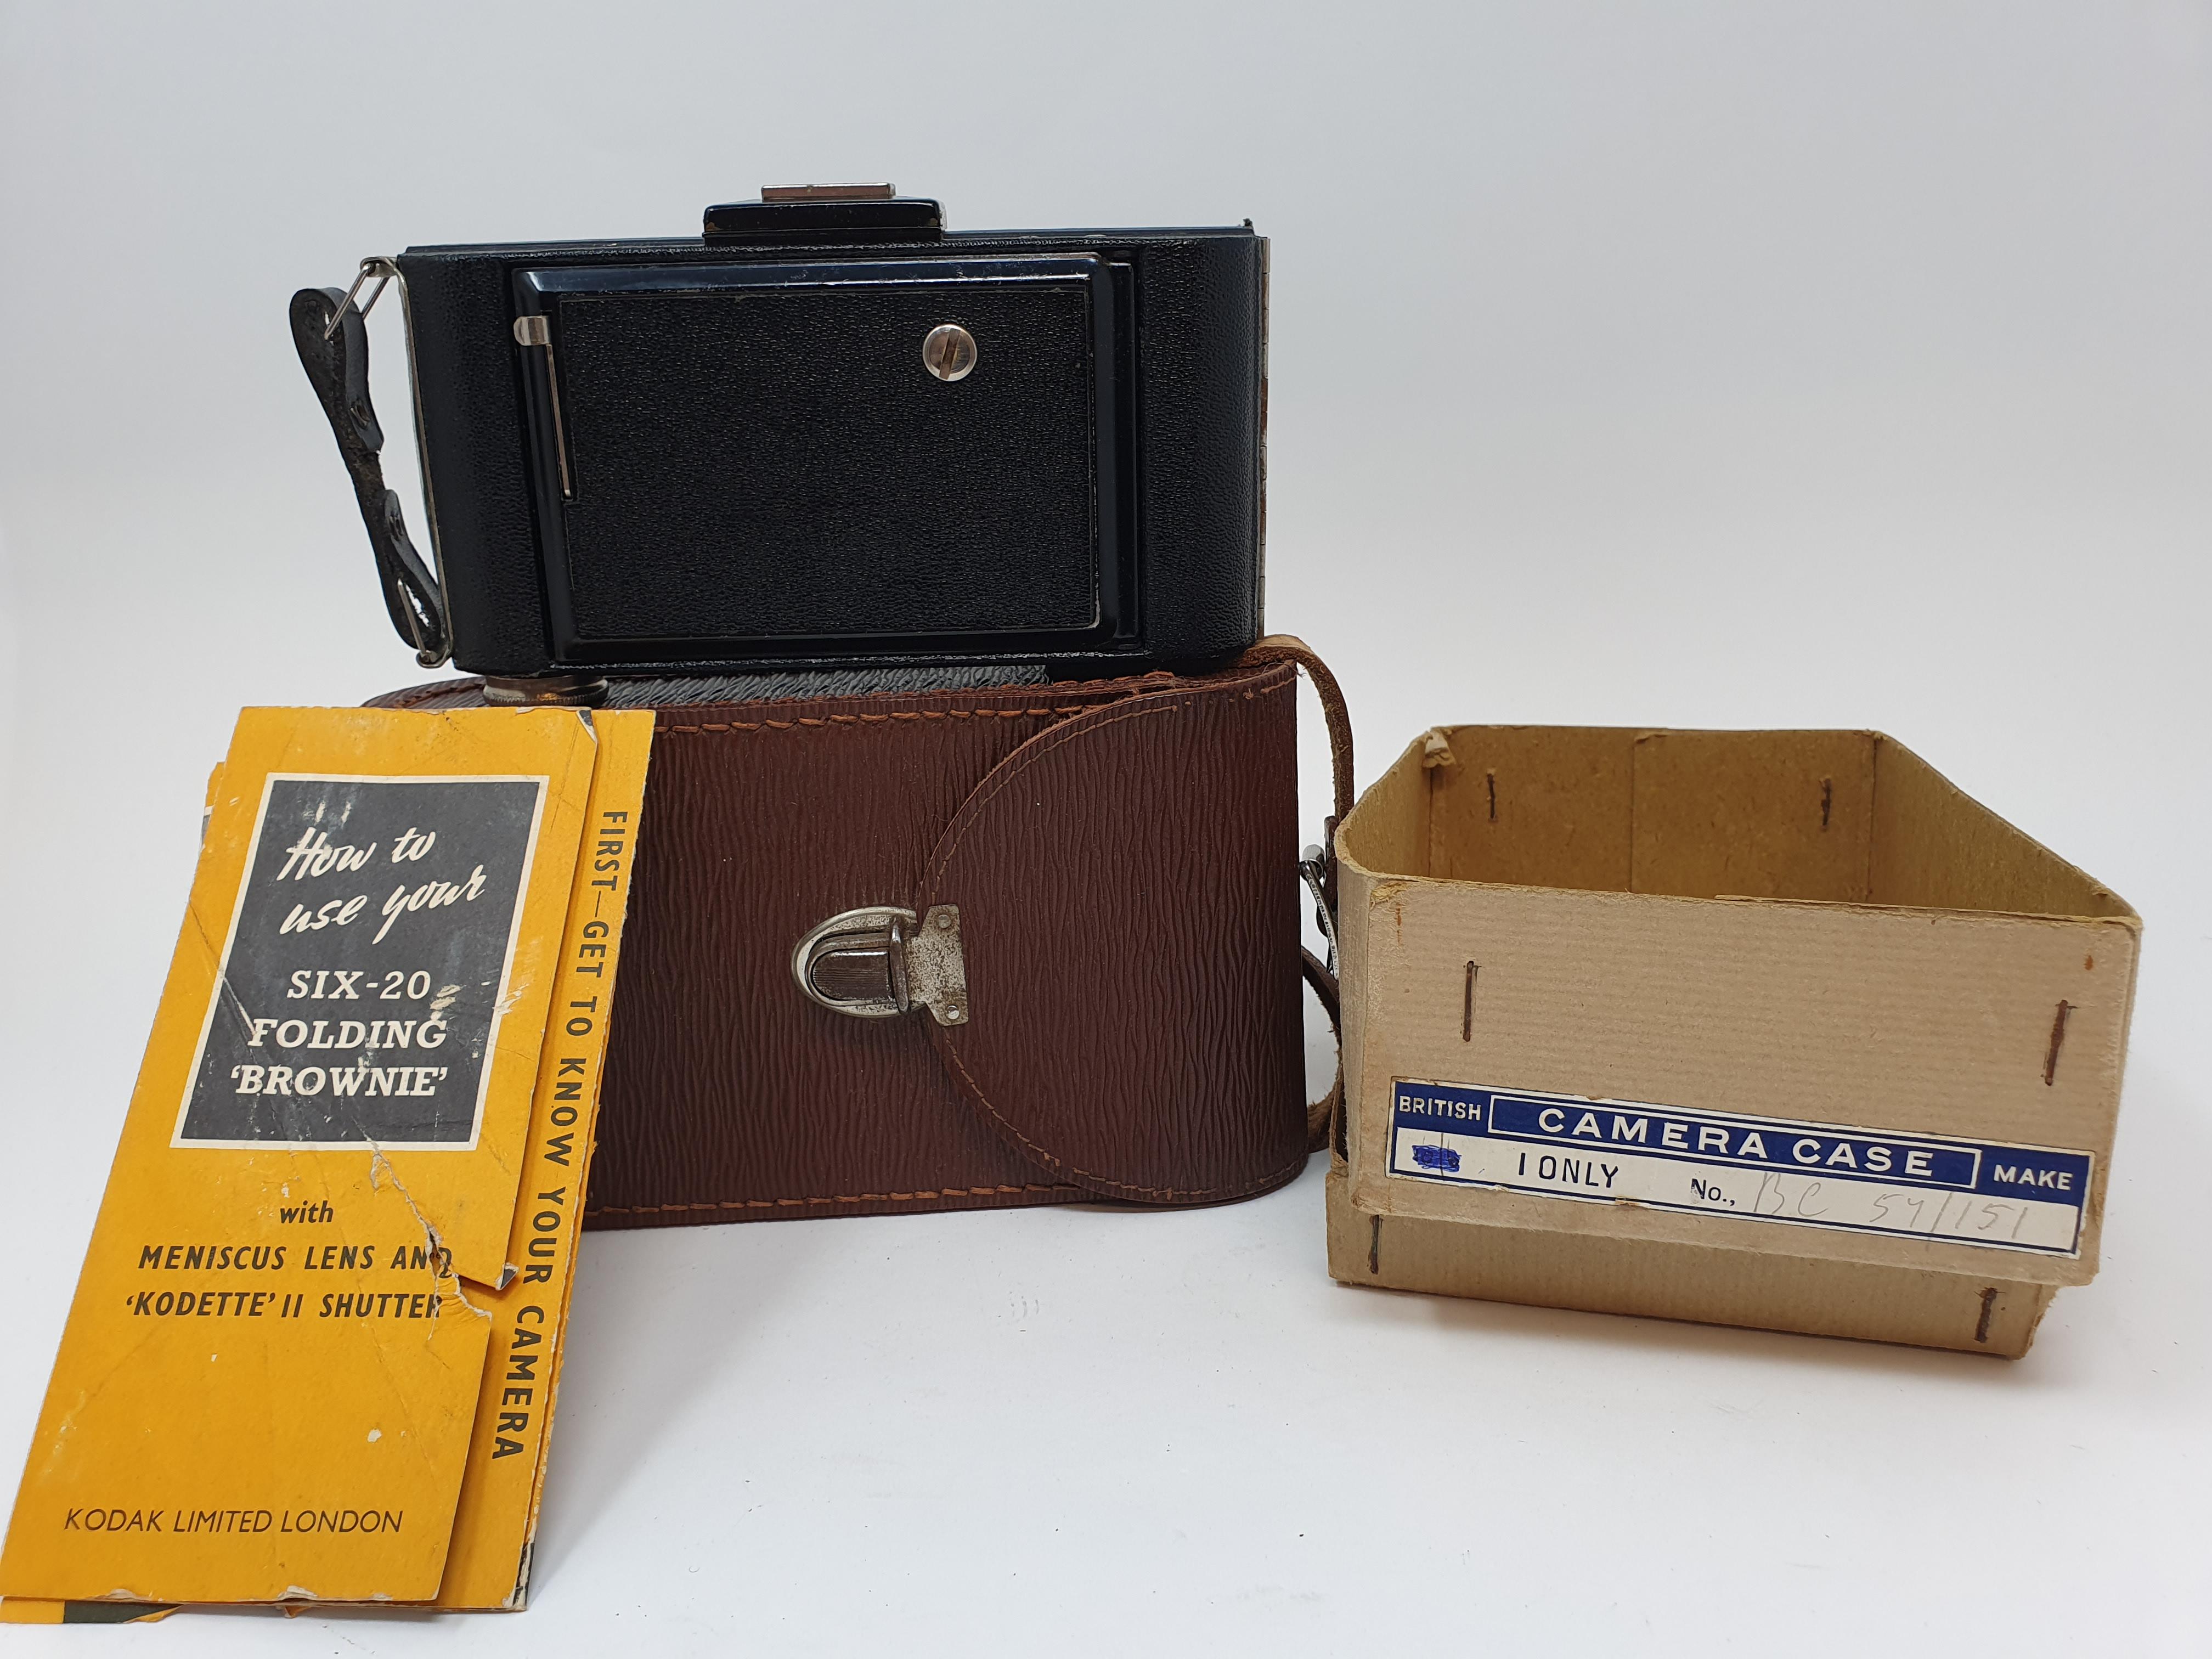 A Kodak Regent folding camera, with leather outer case, a Kodak folding camera, with leather outer - Image 5 of 6